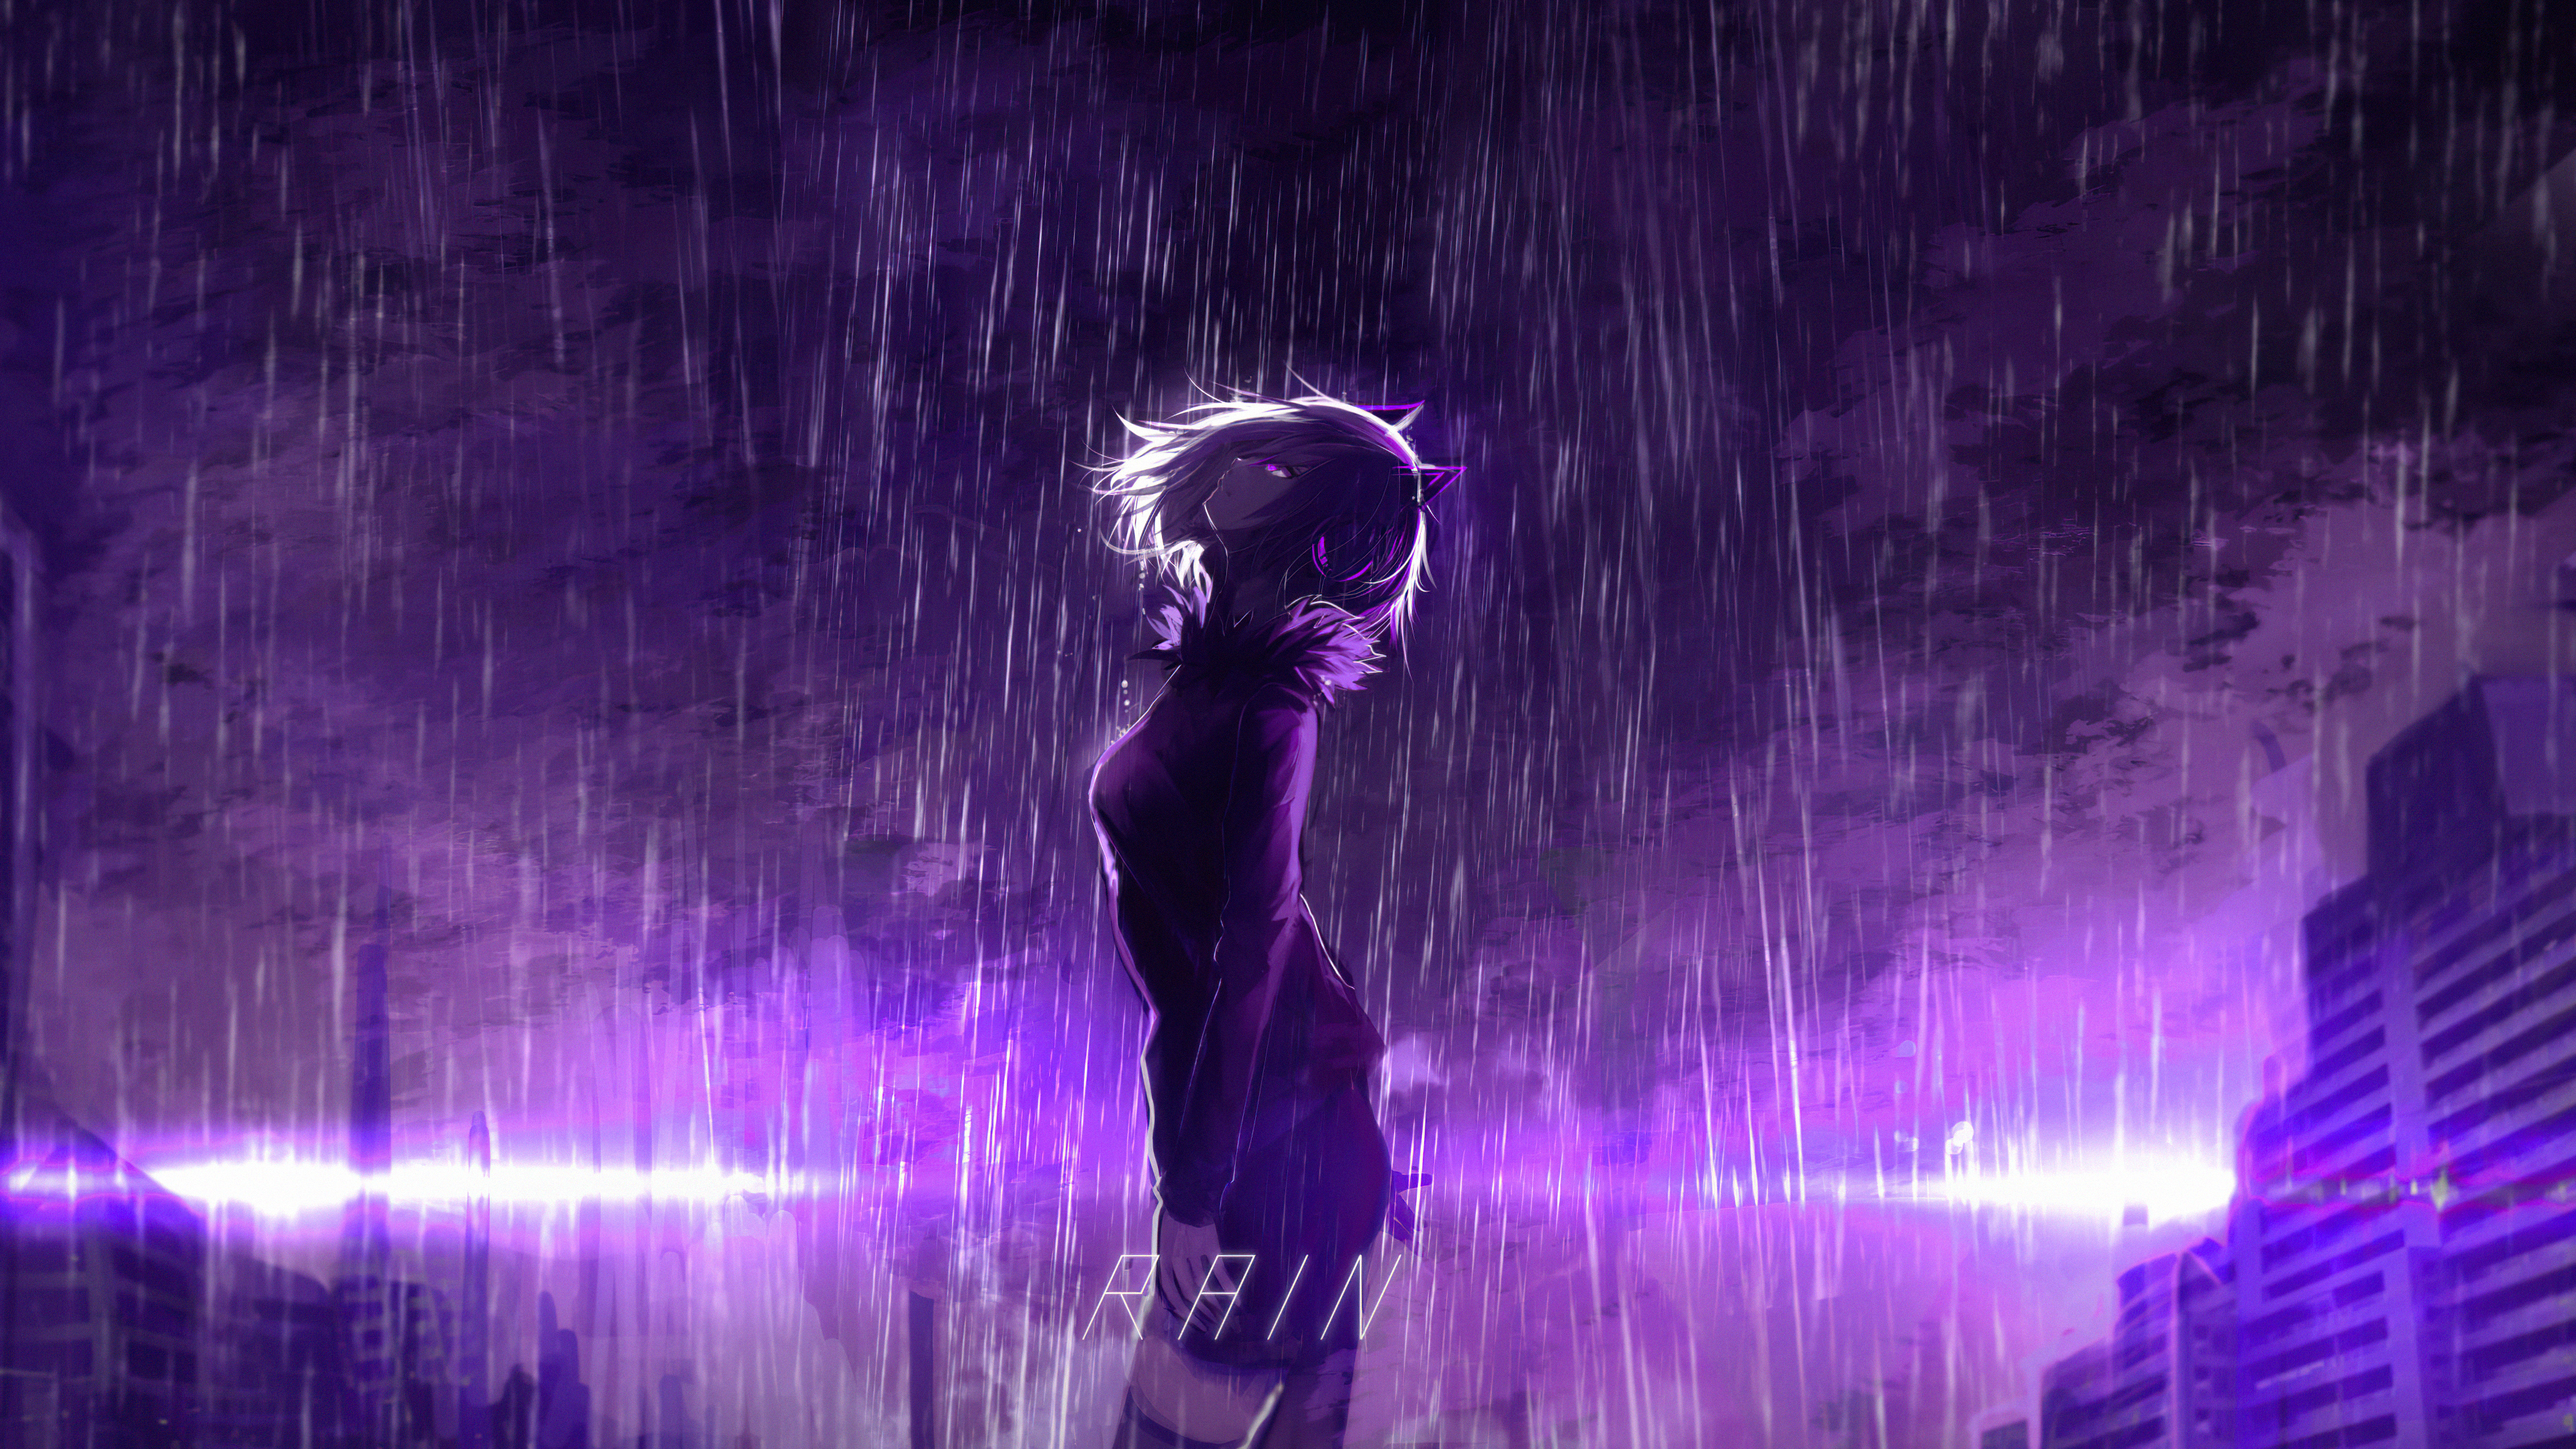 Wallpaper 4k Purple Rain